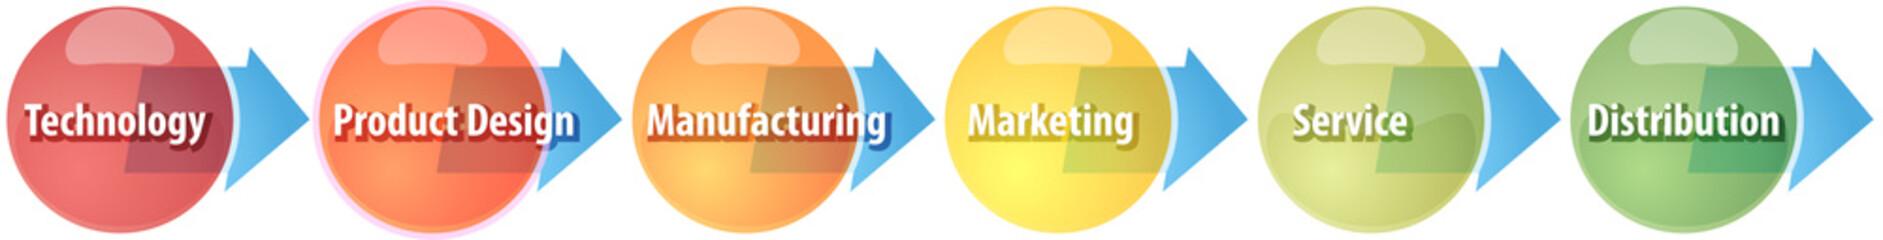 Manufacturing process business diagram illustration